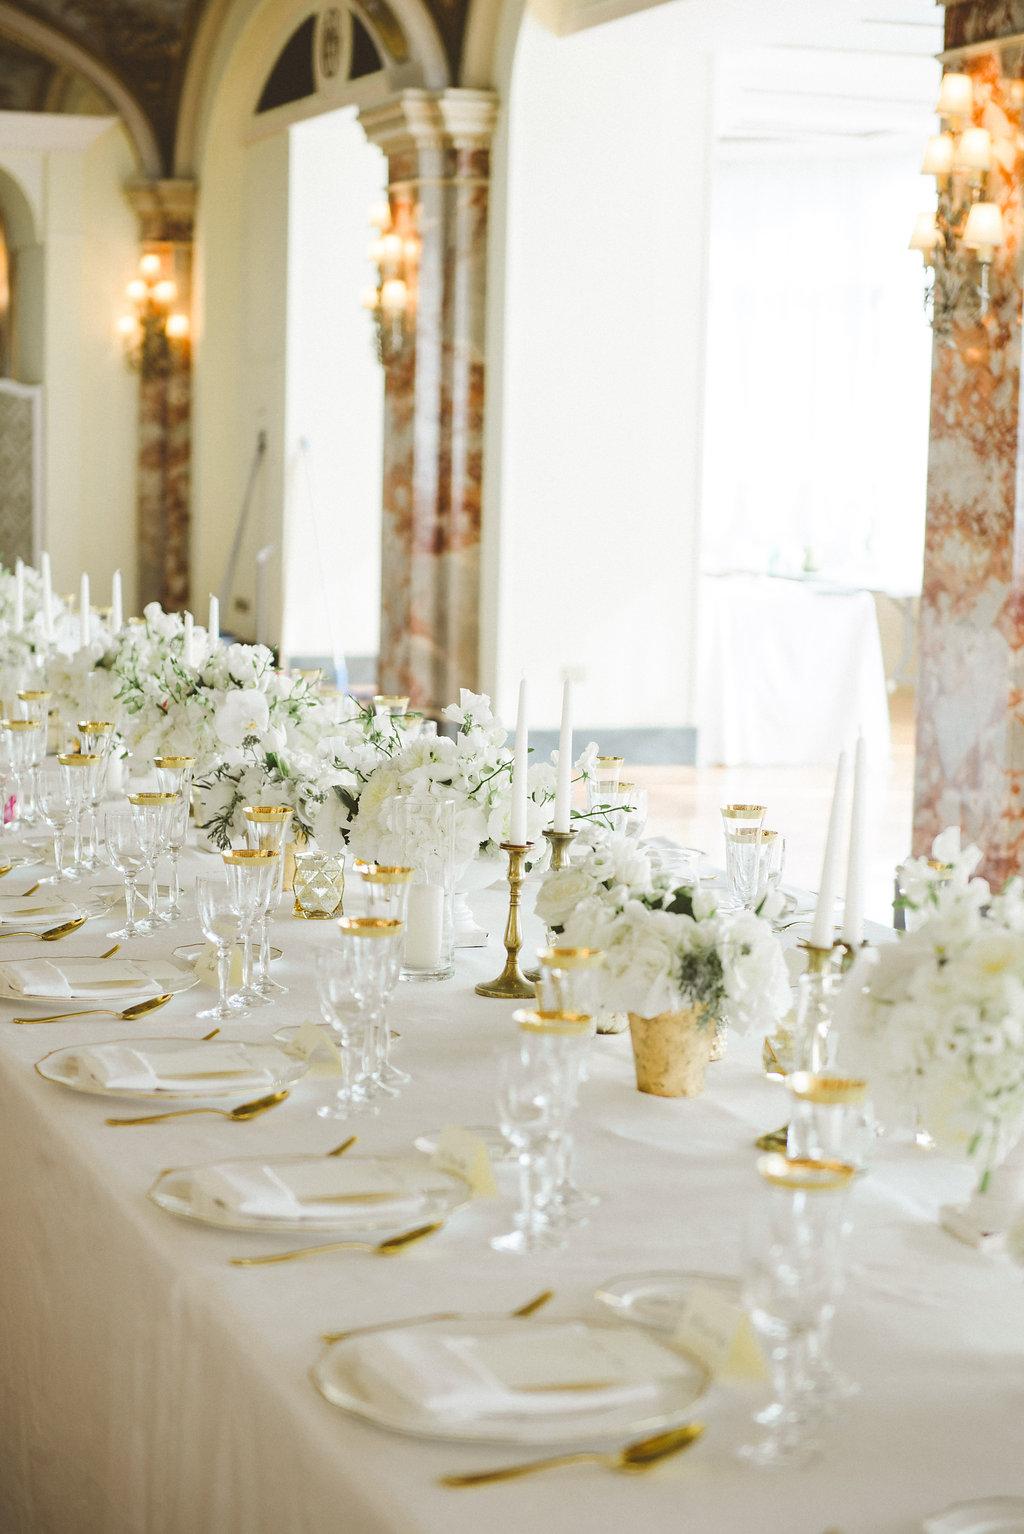 Elegant White & Gold Destination Wedding with Reem Acra Bridal Gown